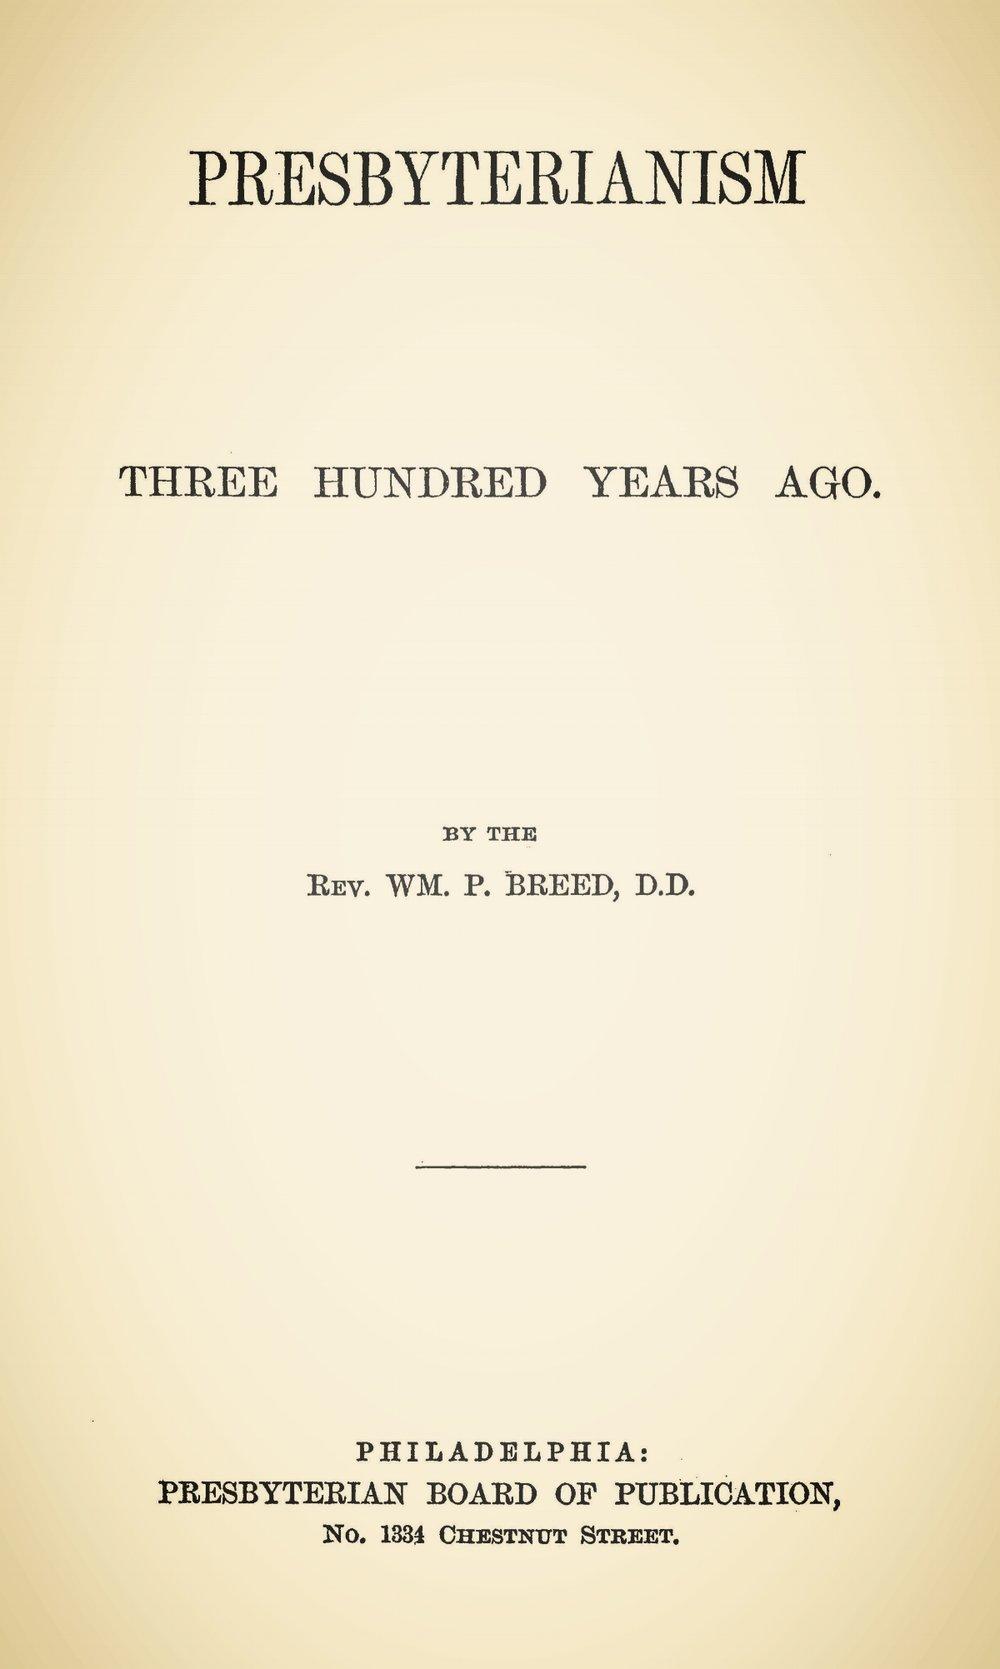 Breed, William Pratt, Presbyterianism Three Hundred Years Ago Title Page.jpg